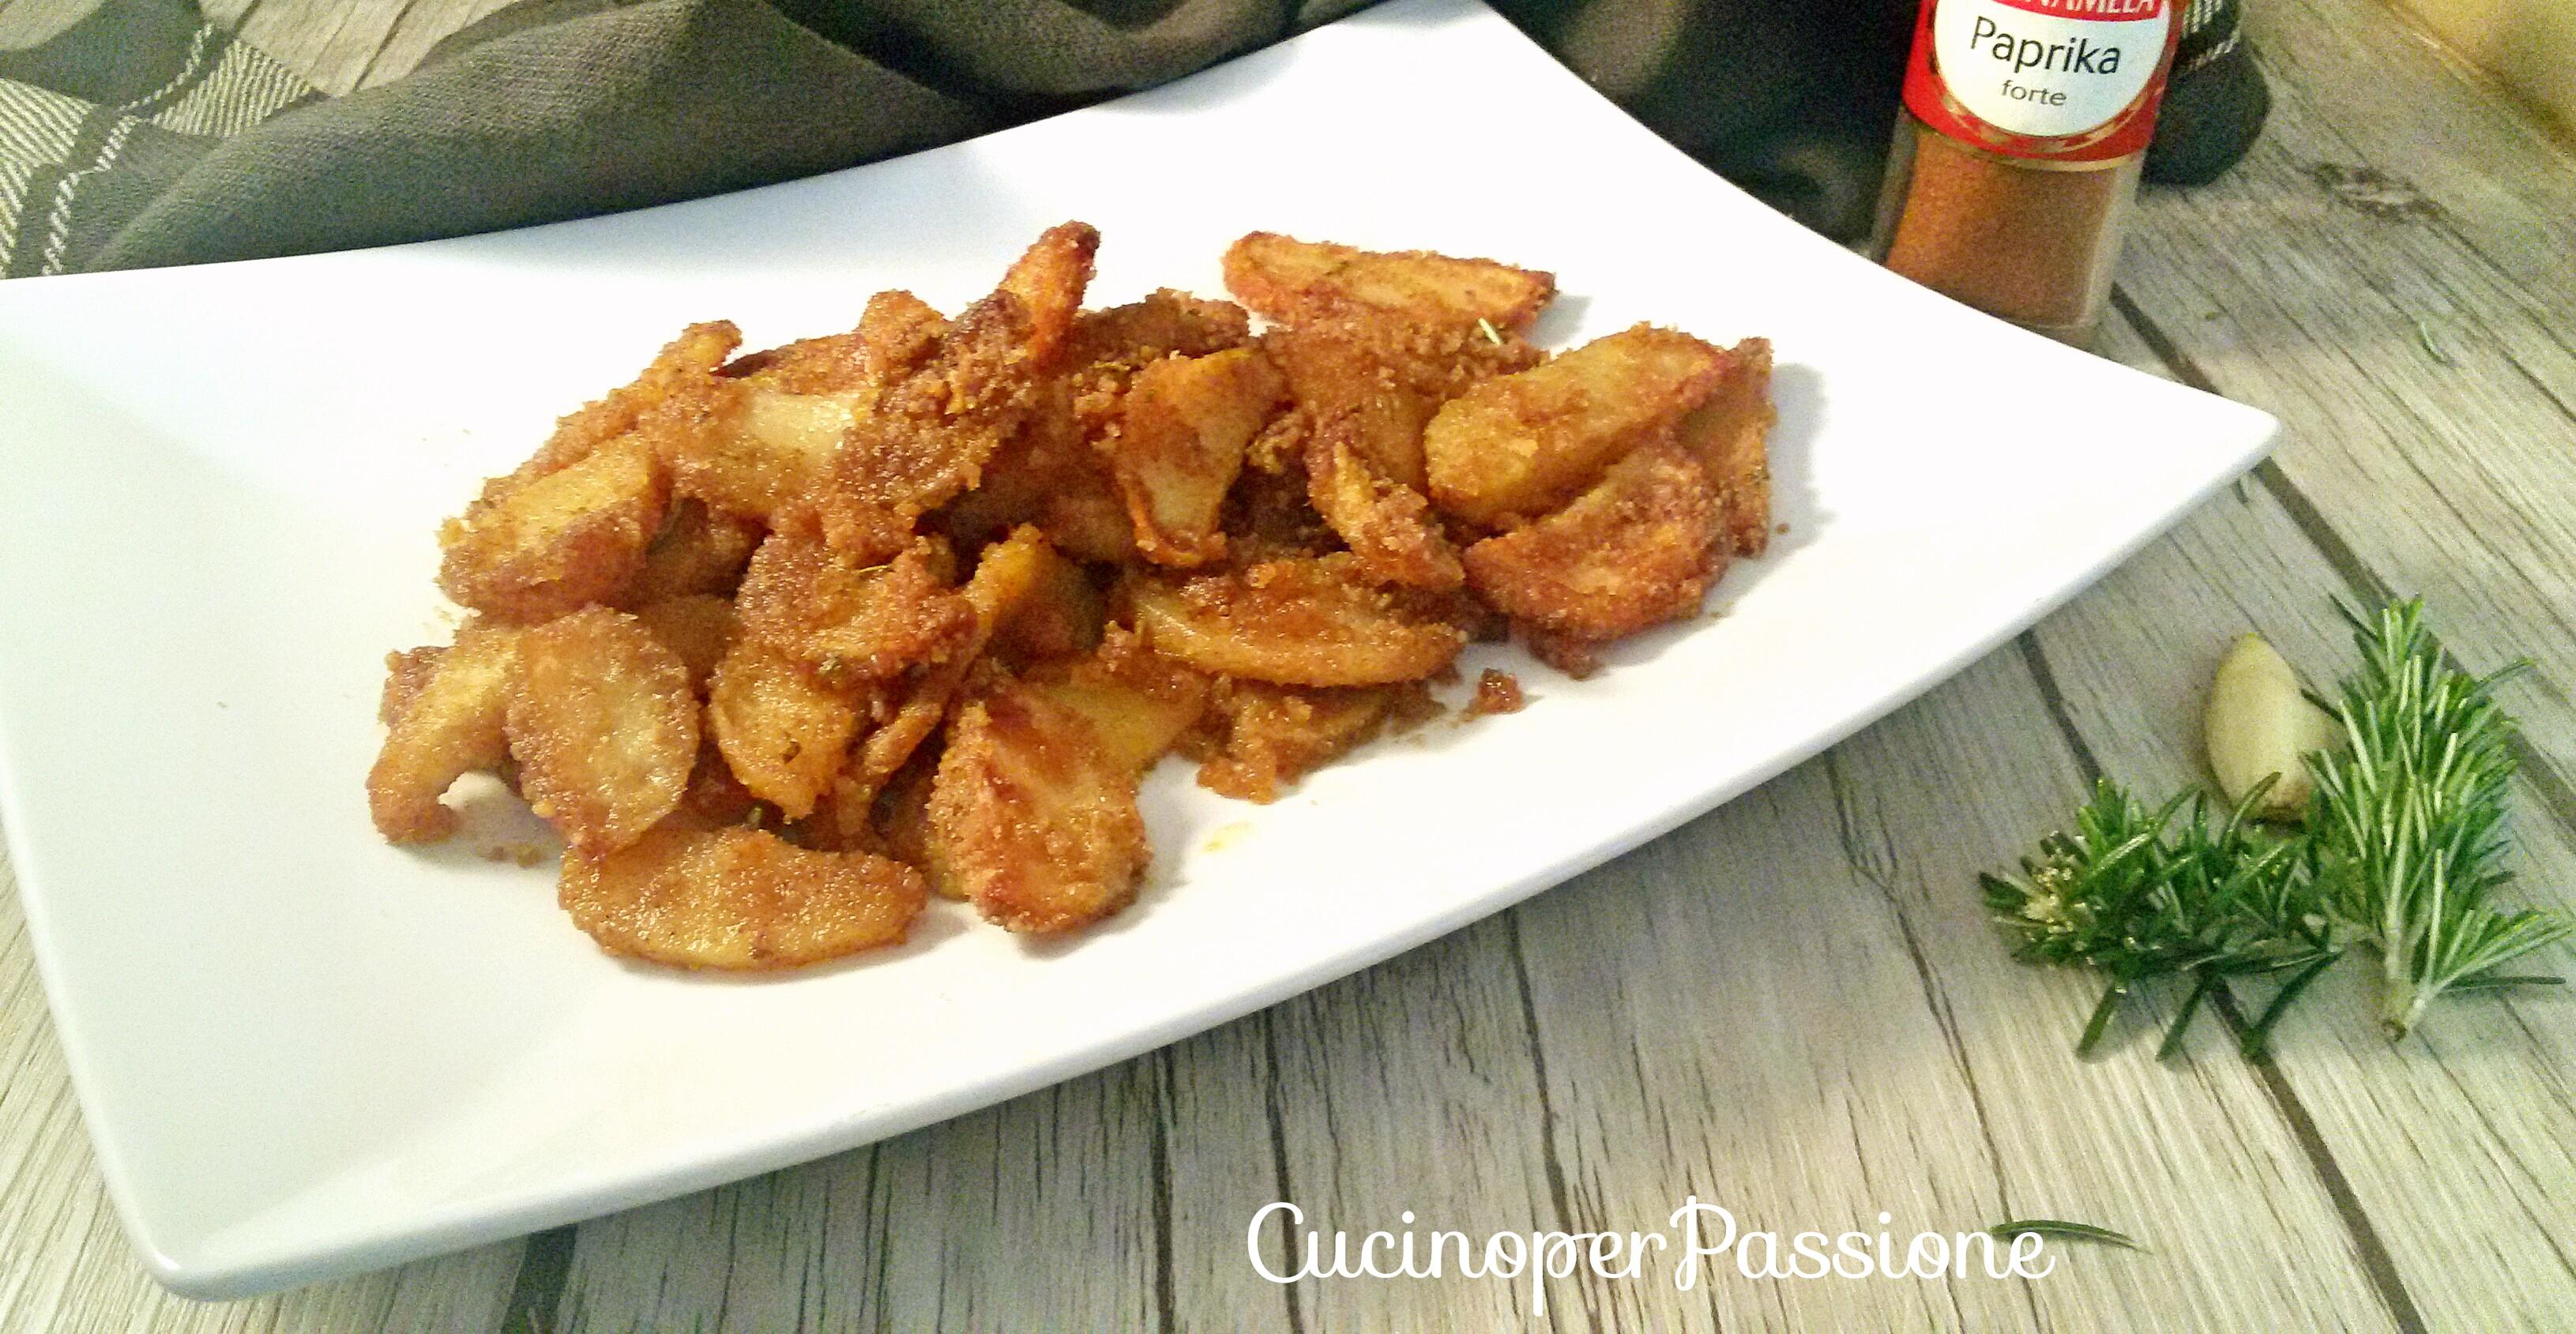 Ricetta Patate Sabbiose alla Paprika